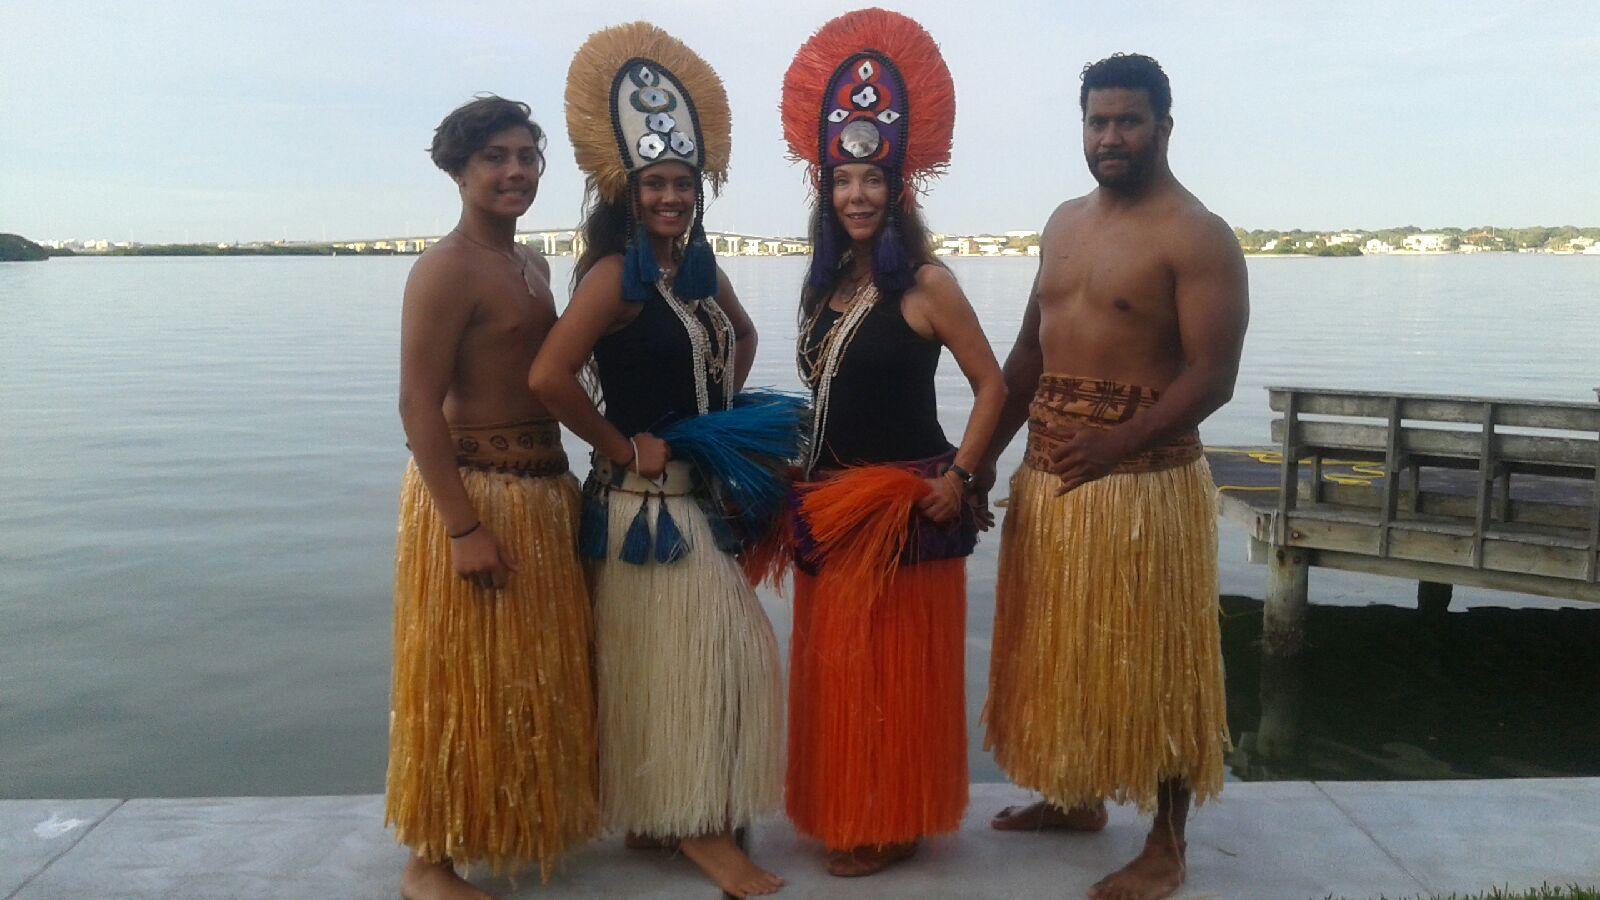 people representing a Hawaiian Luau